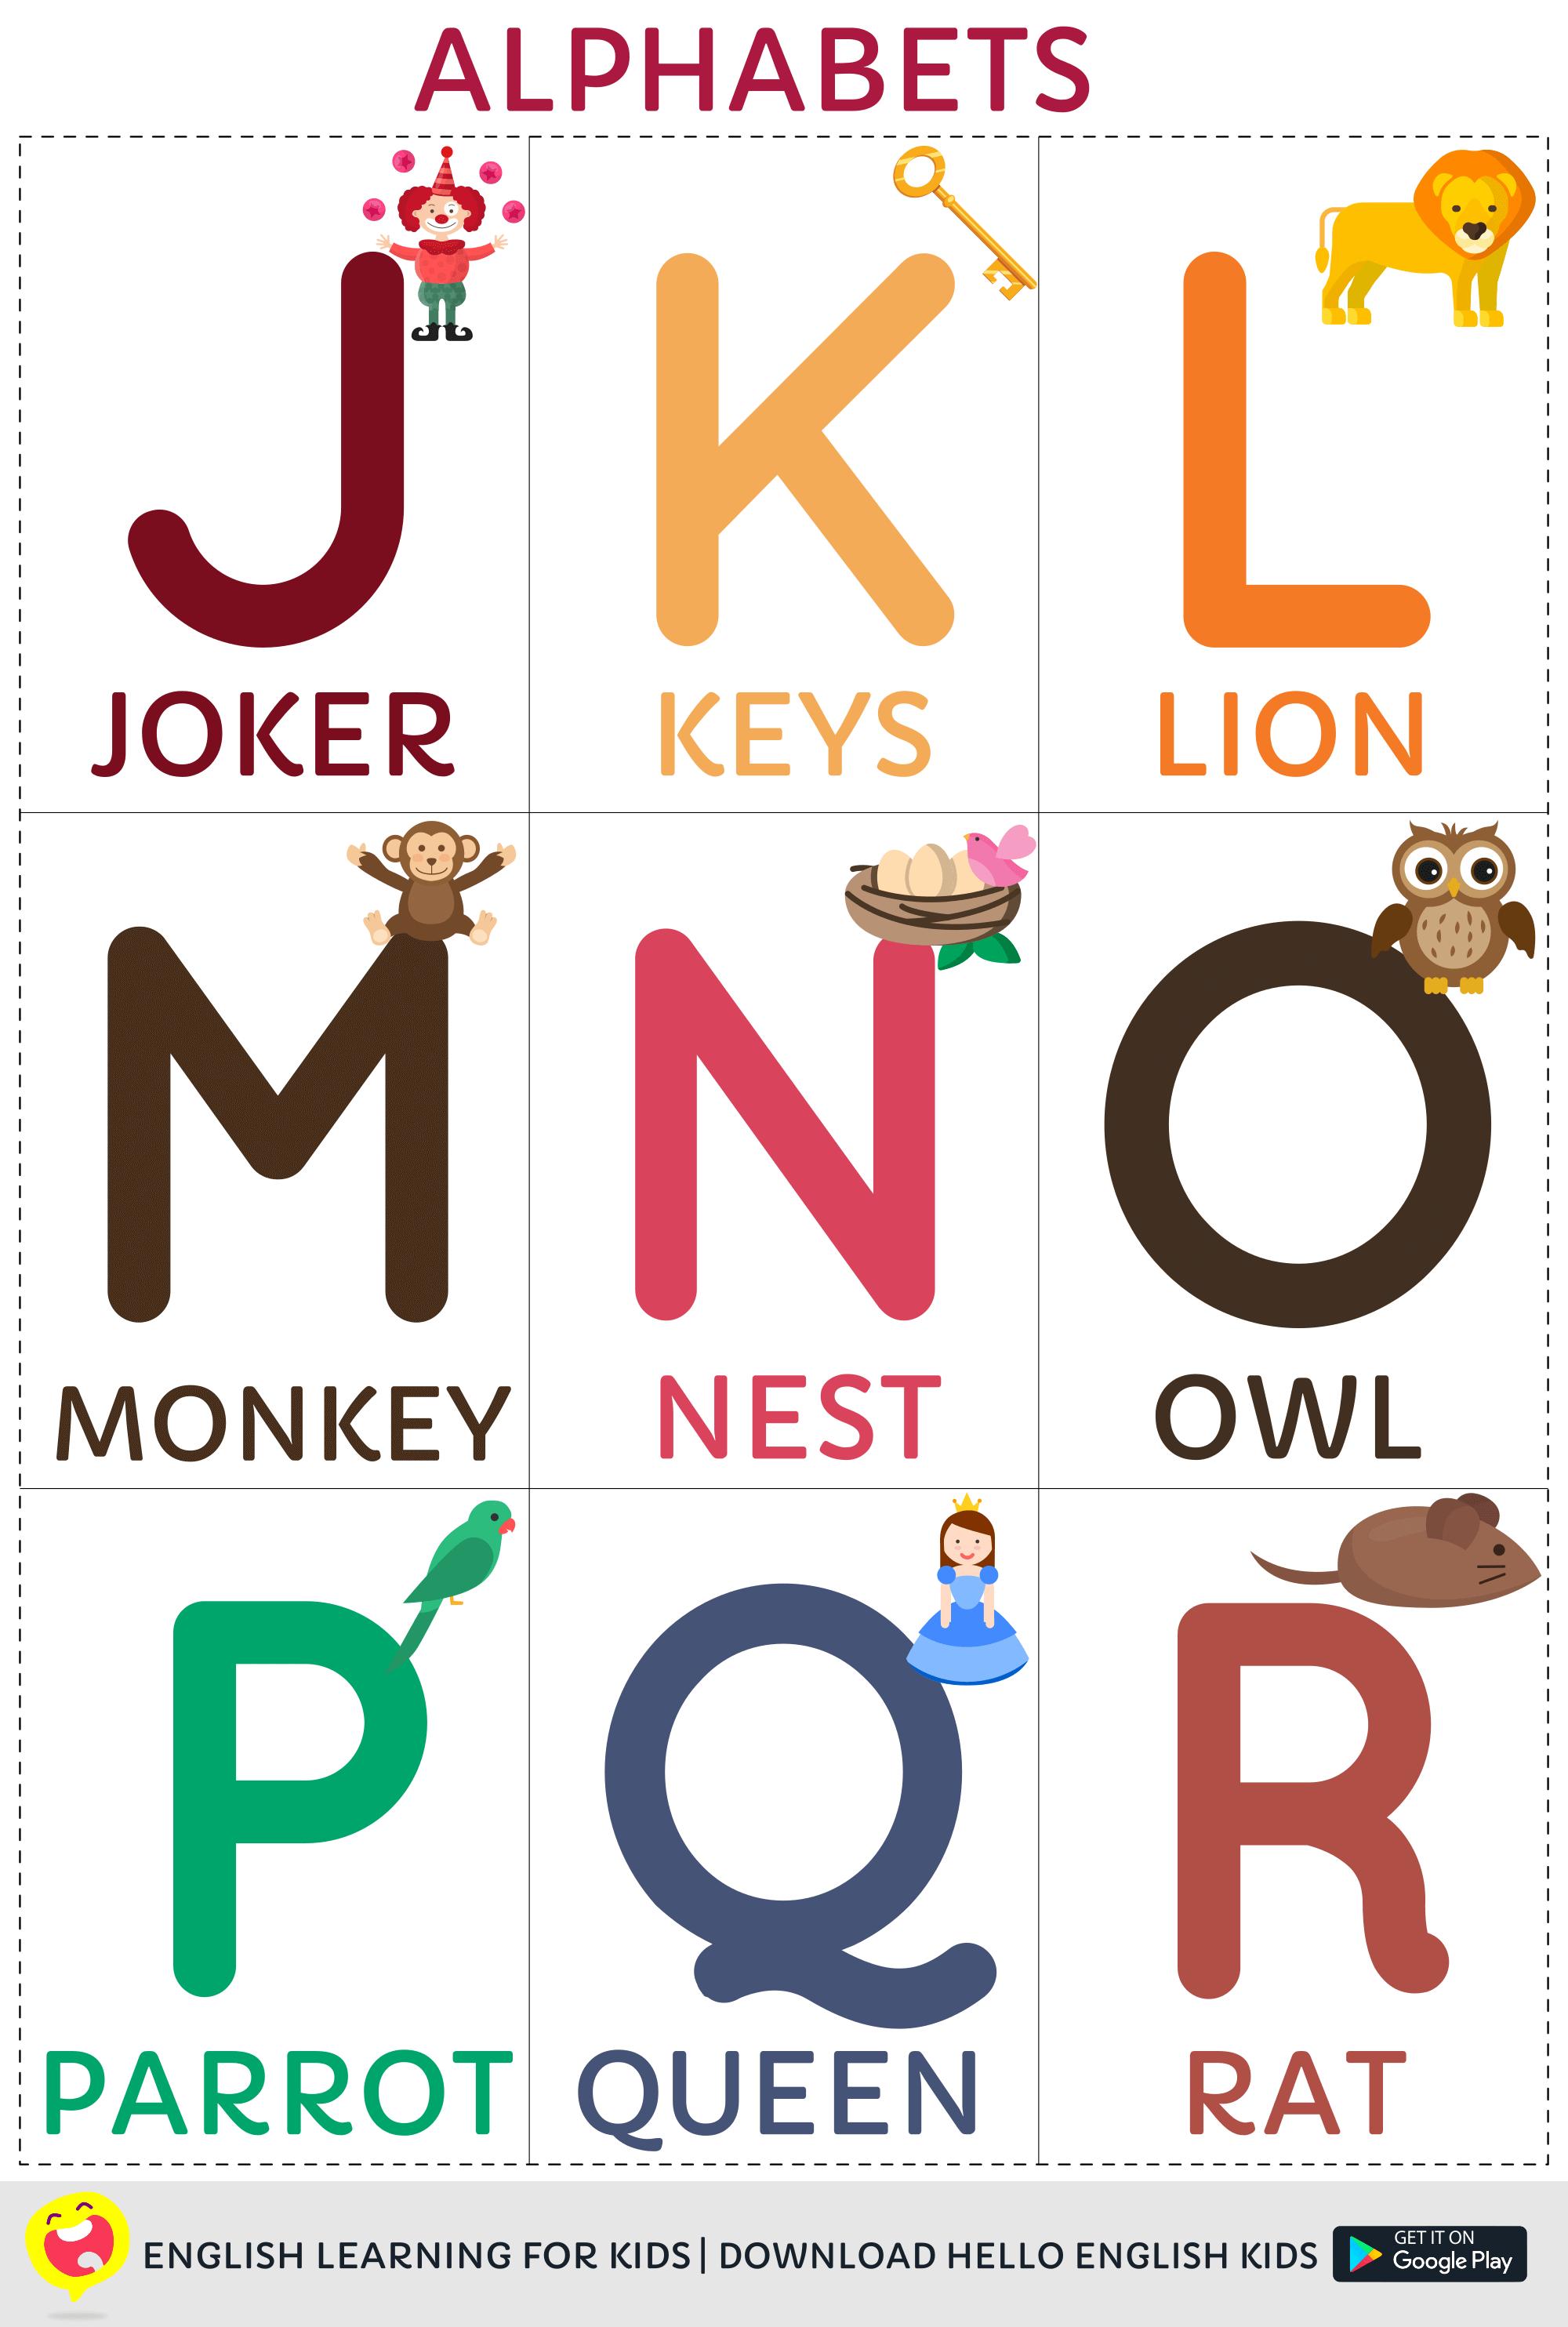 Hello English Kids Printable - A-Z Alphabets - Kids App by HelloEnglish